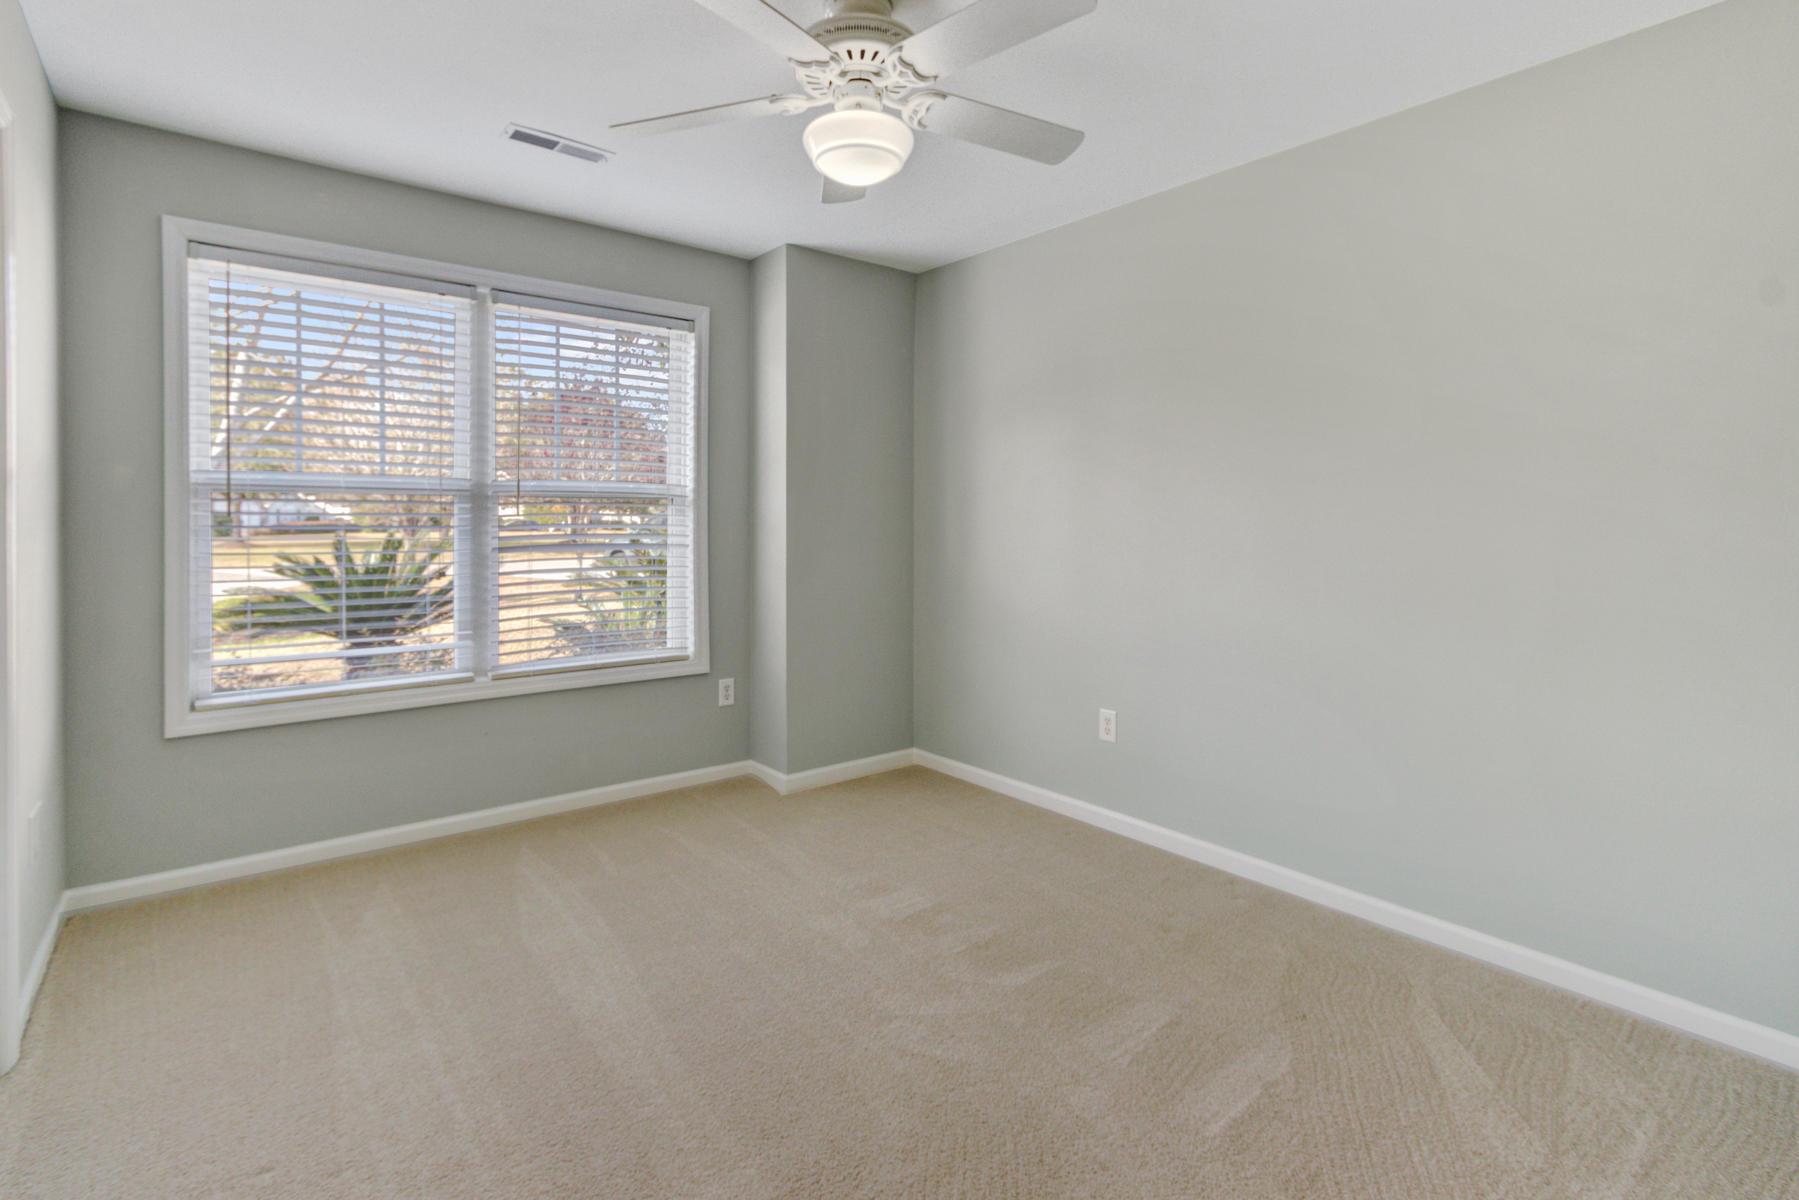 Park West Homes For Sale - 3444 Wellesley, Mount Pleasant, SC - 12